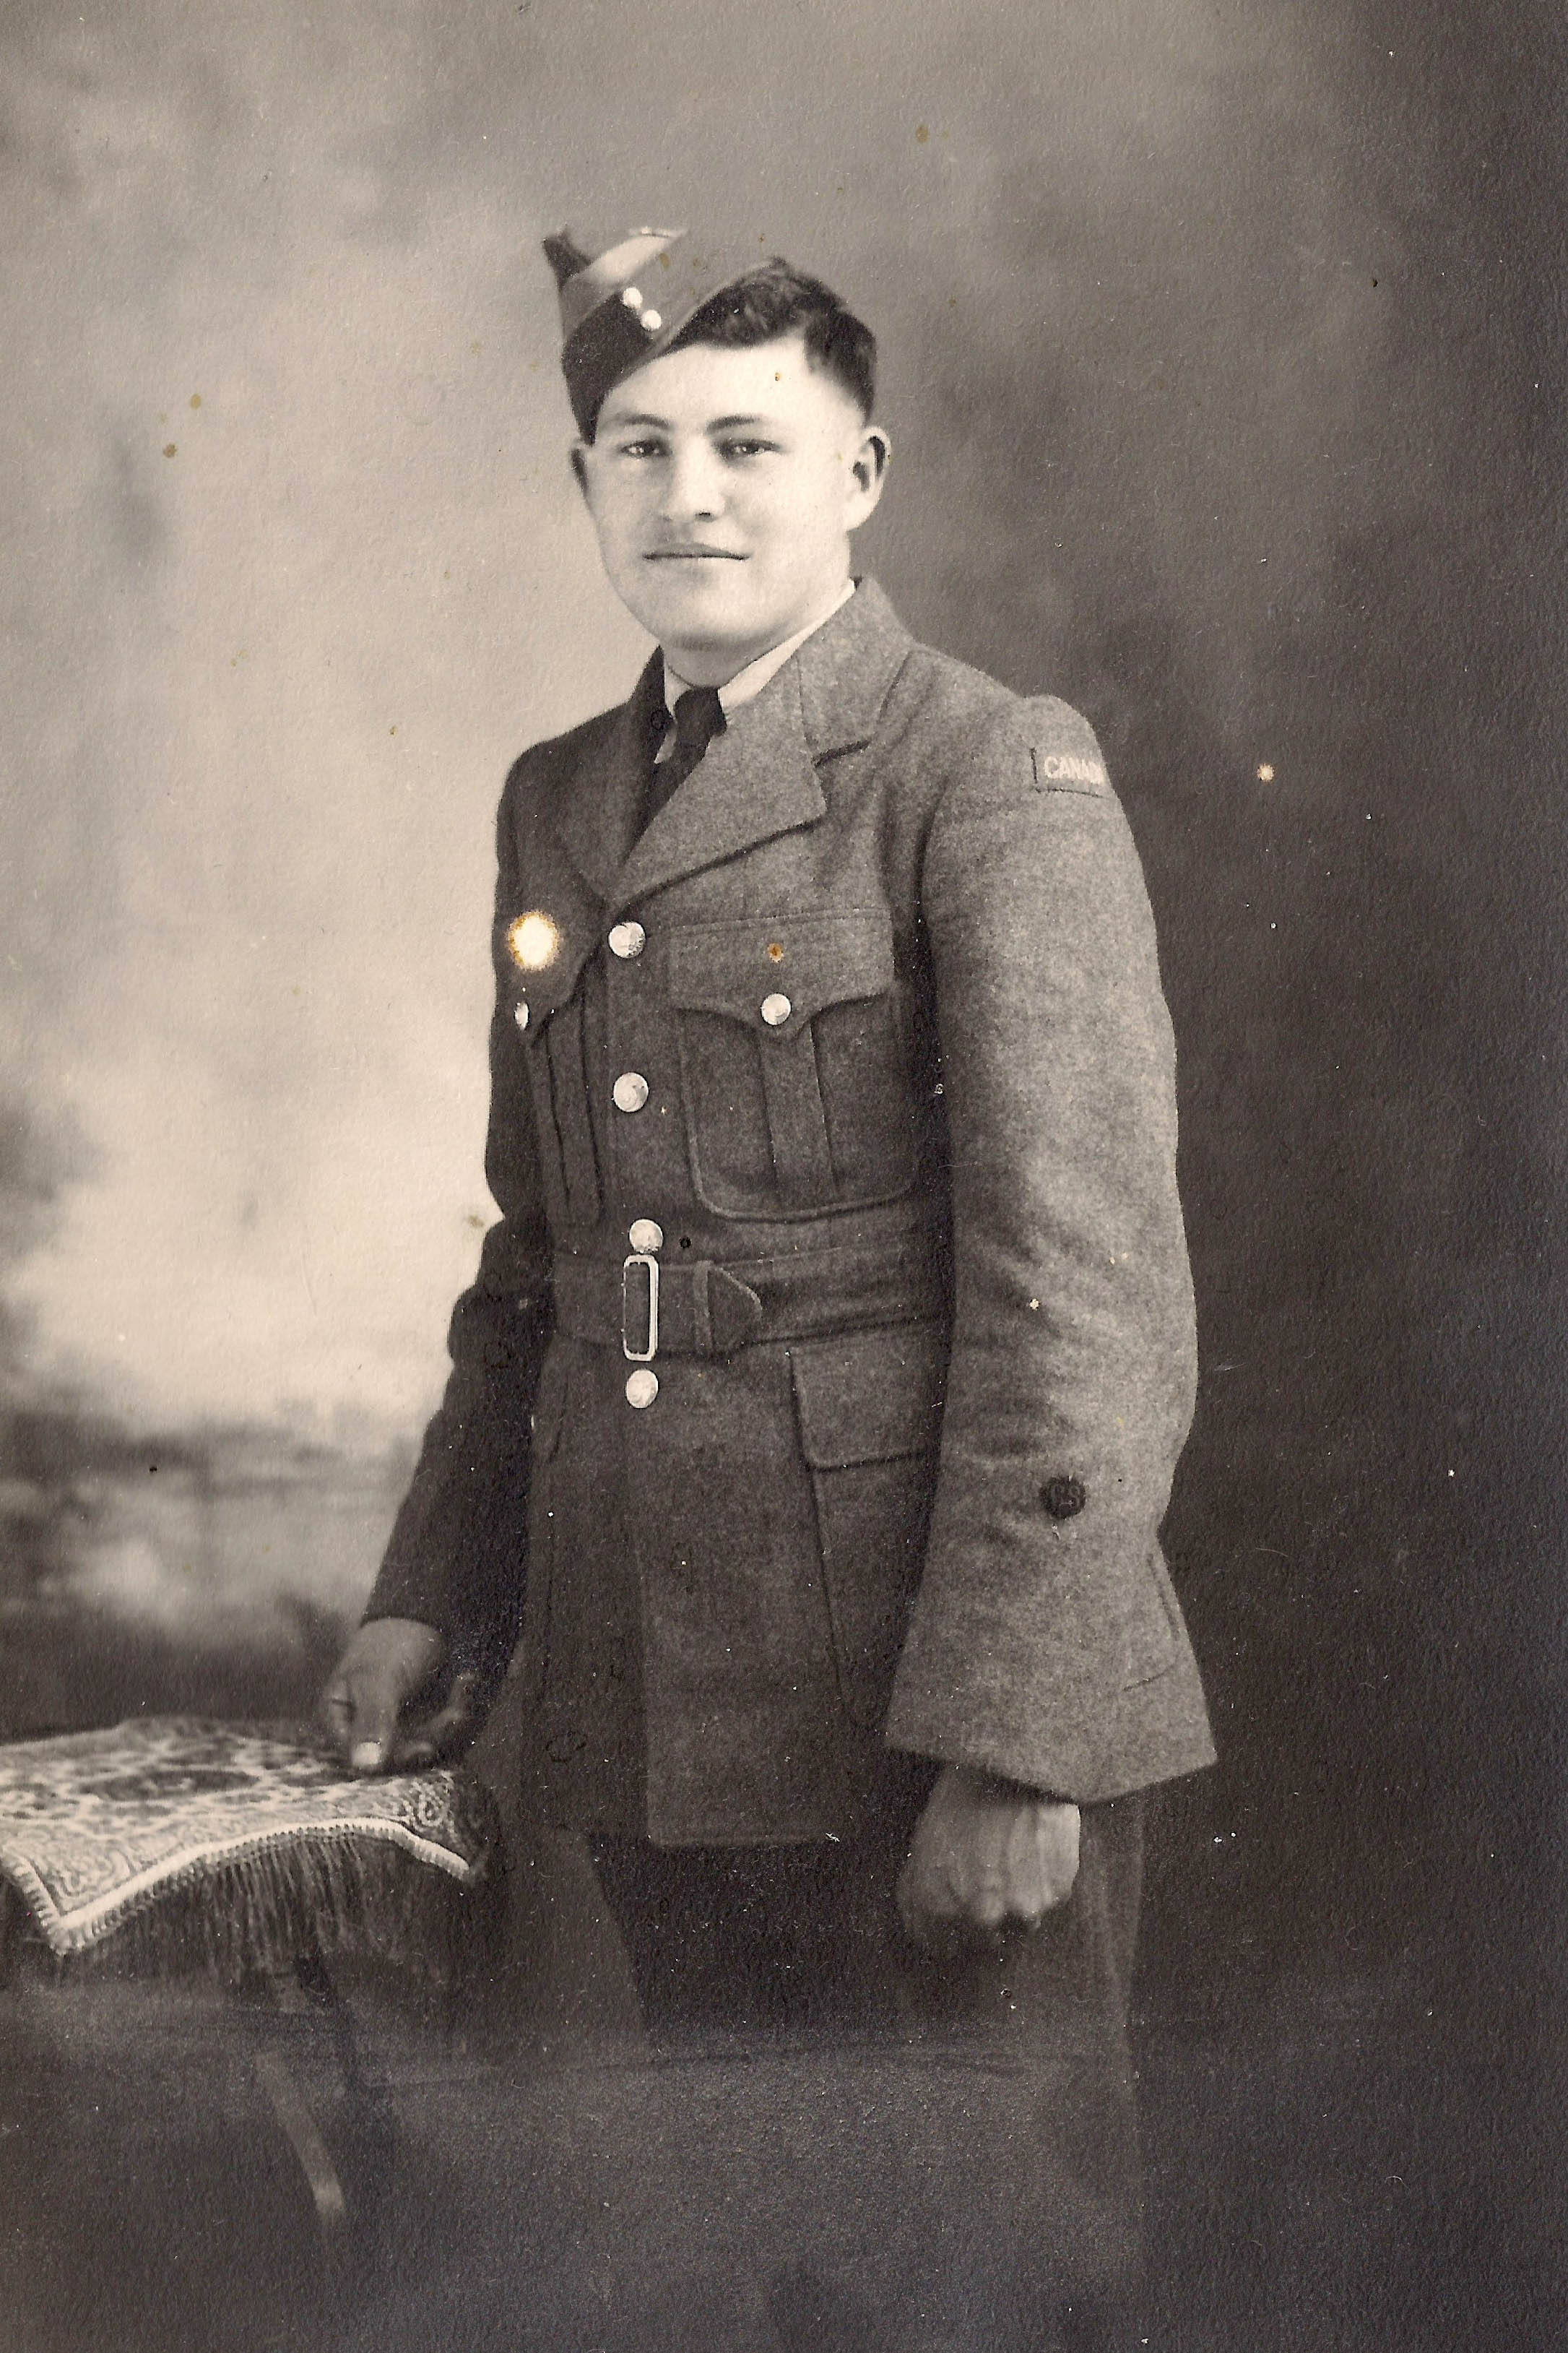 Francis William Godon